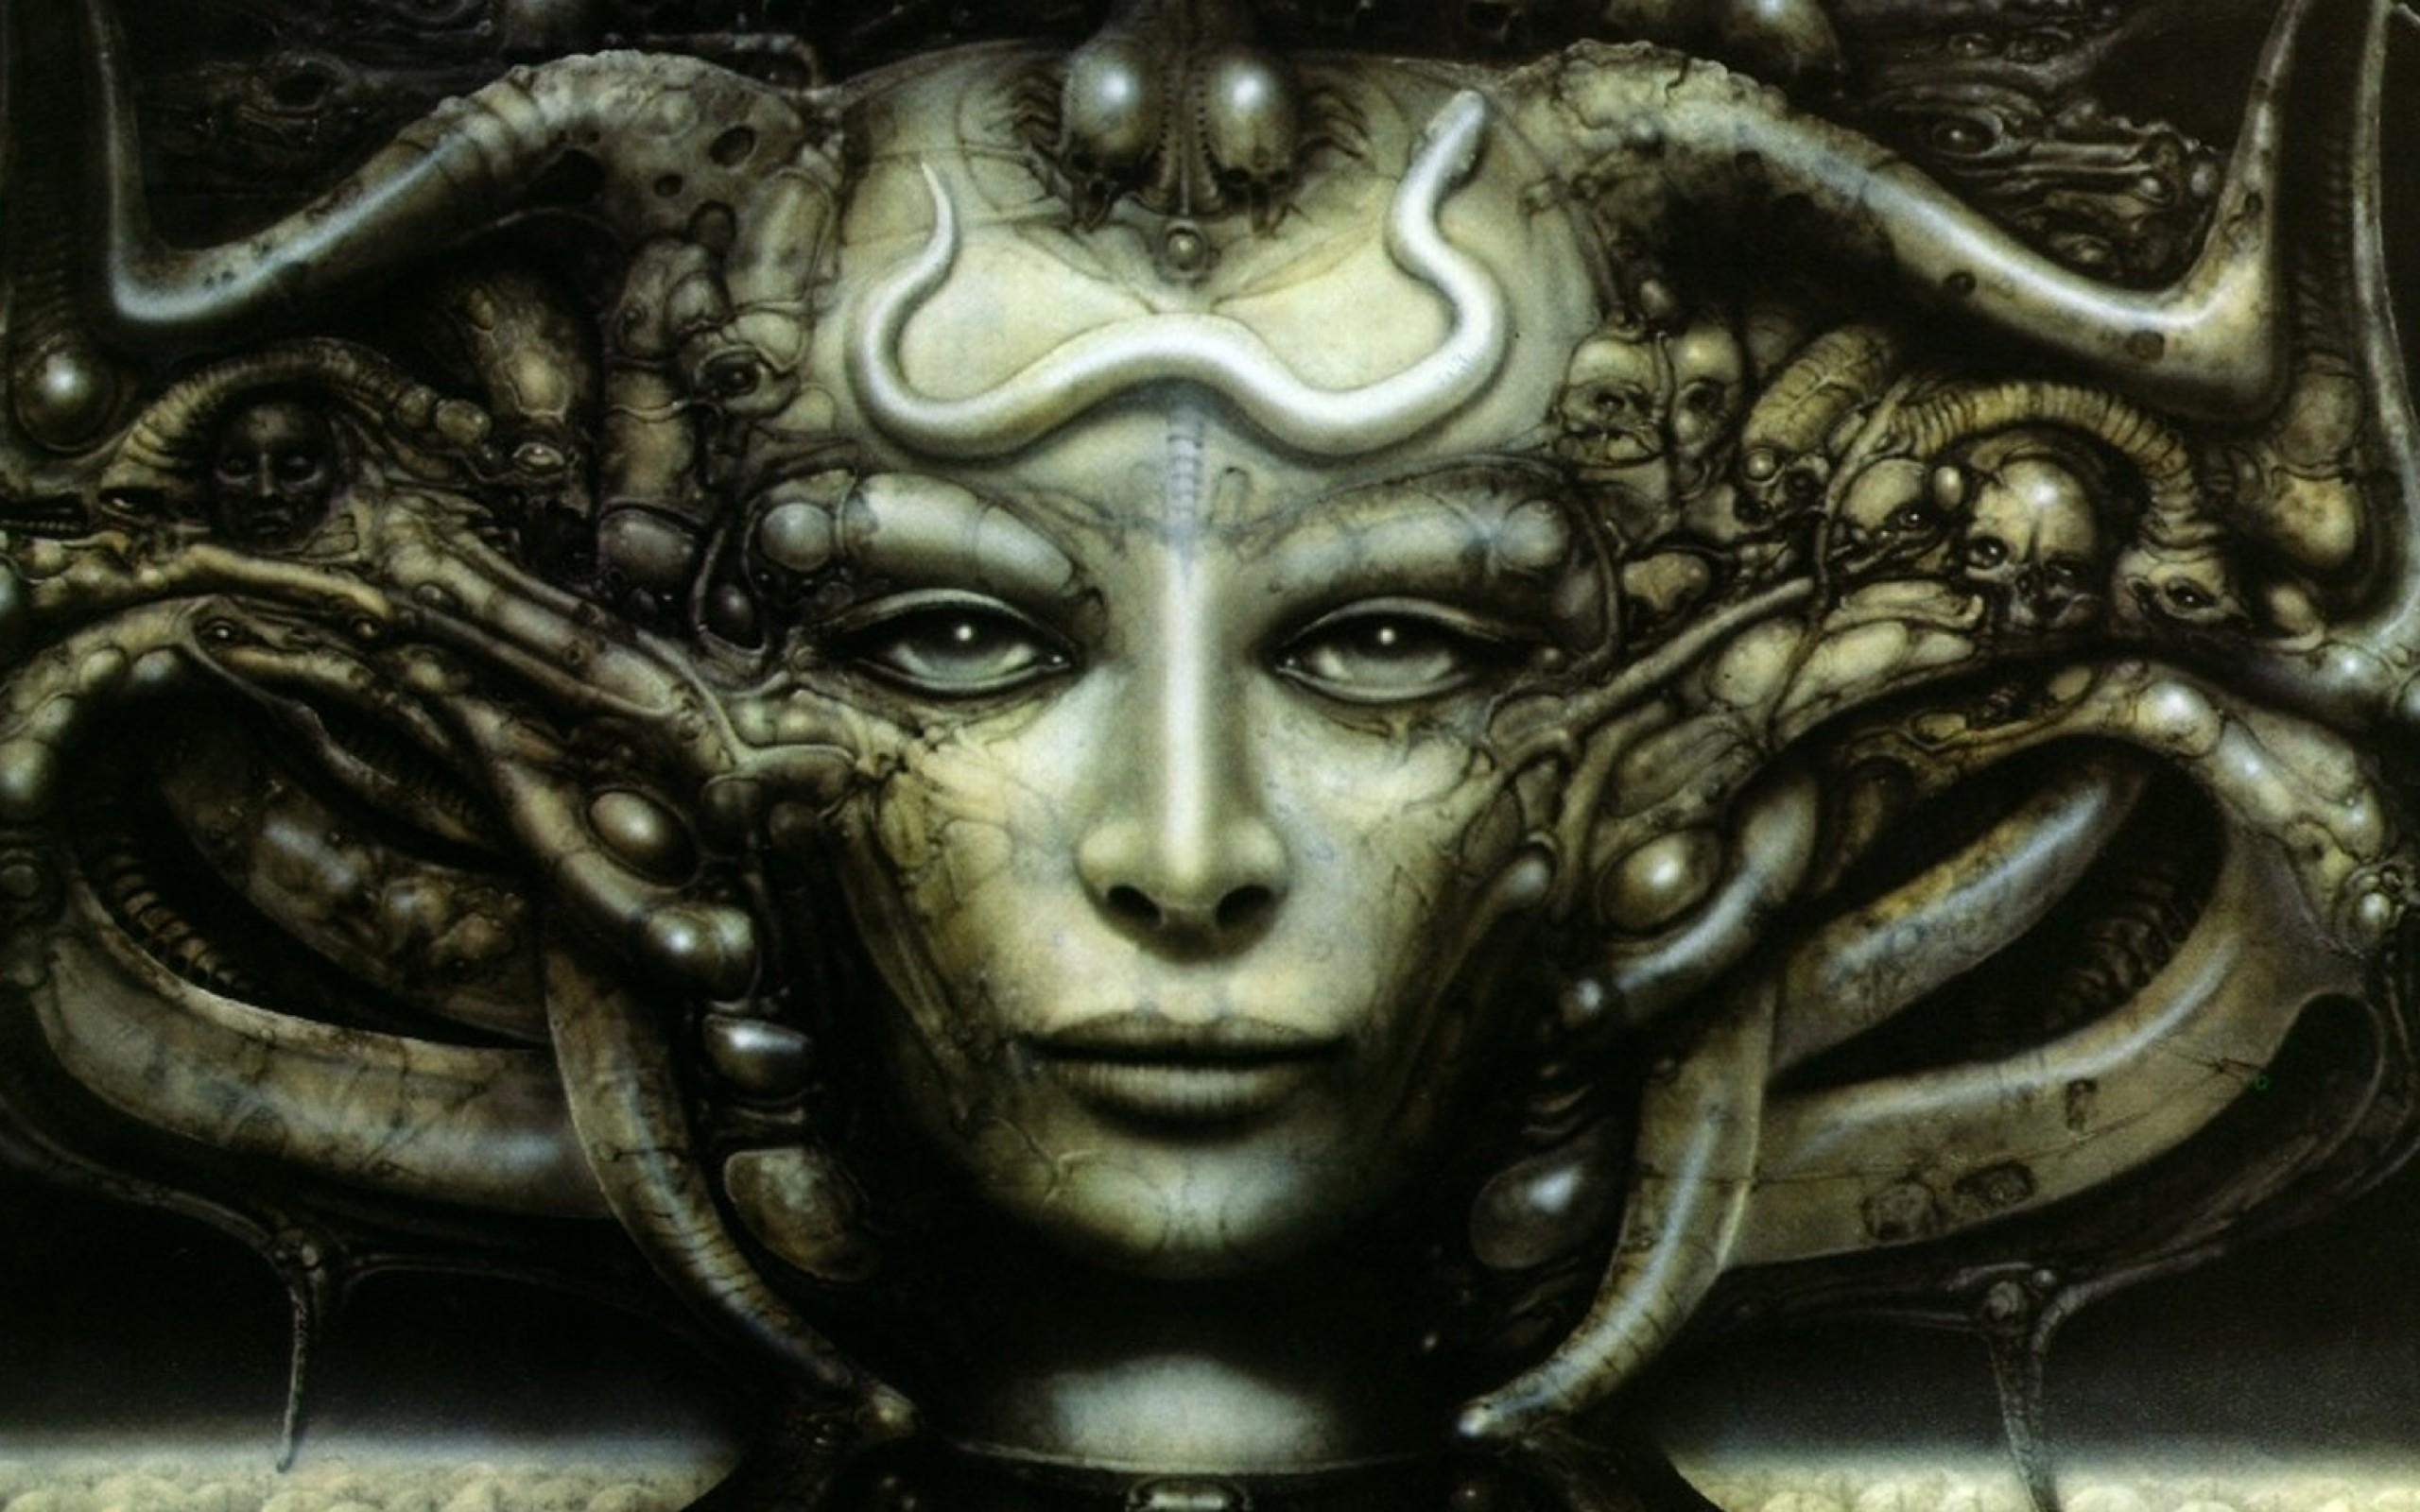 hr giger necronomicon artwork 1680×1050 wallpaper Art HD Wallpaper